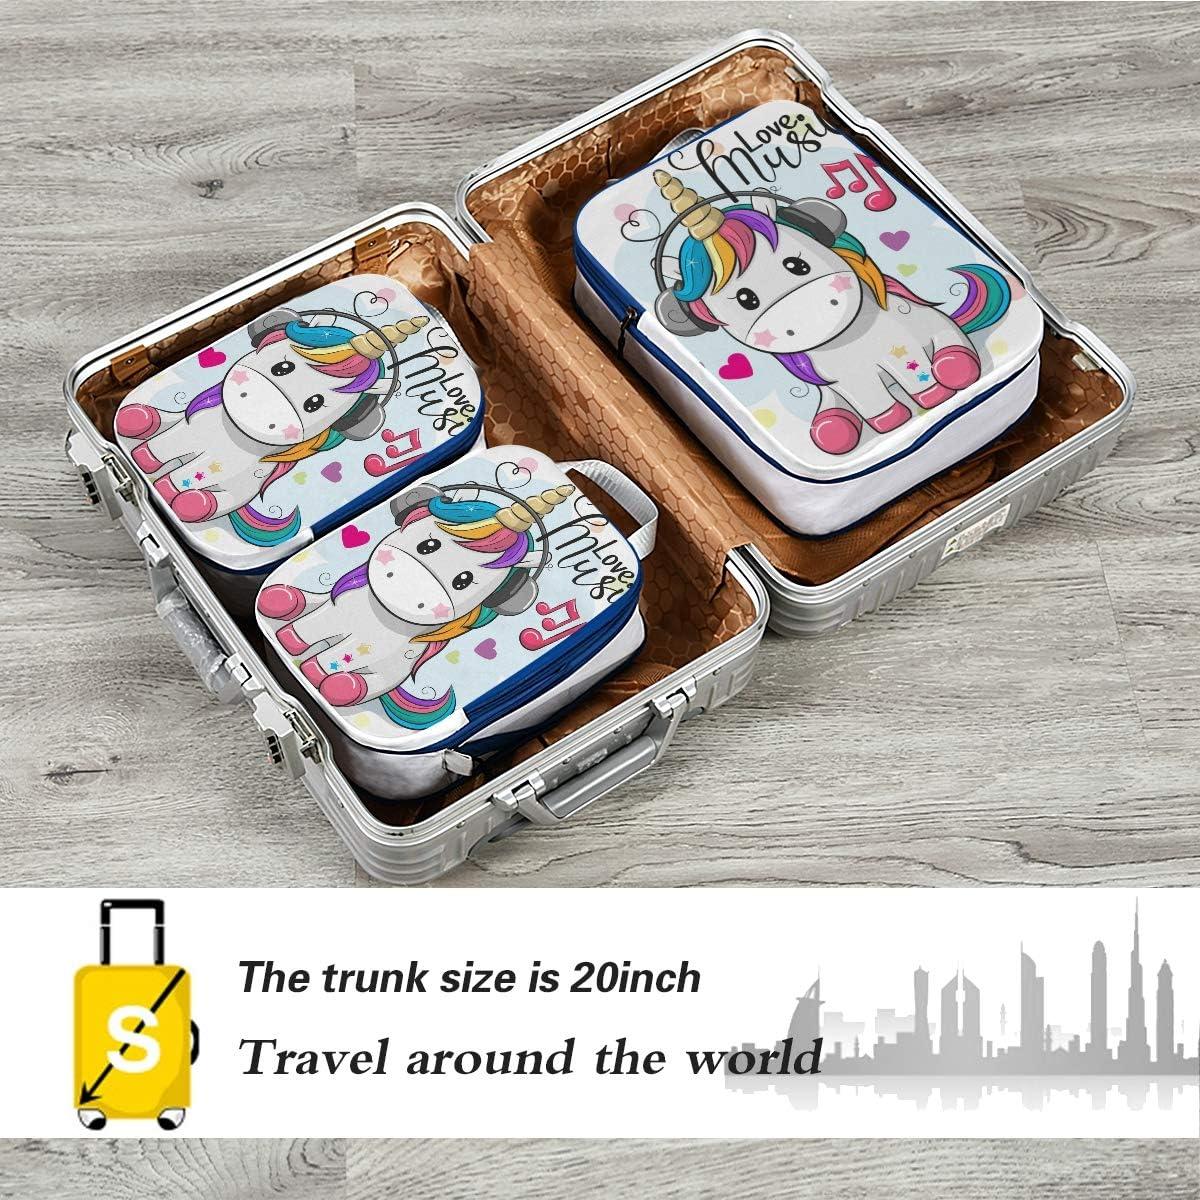 c Unicorn With Headphones 3 Set Packing Cubes,2 Various Sizes Travel Luggage Packing Organizers